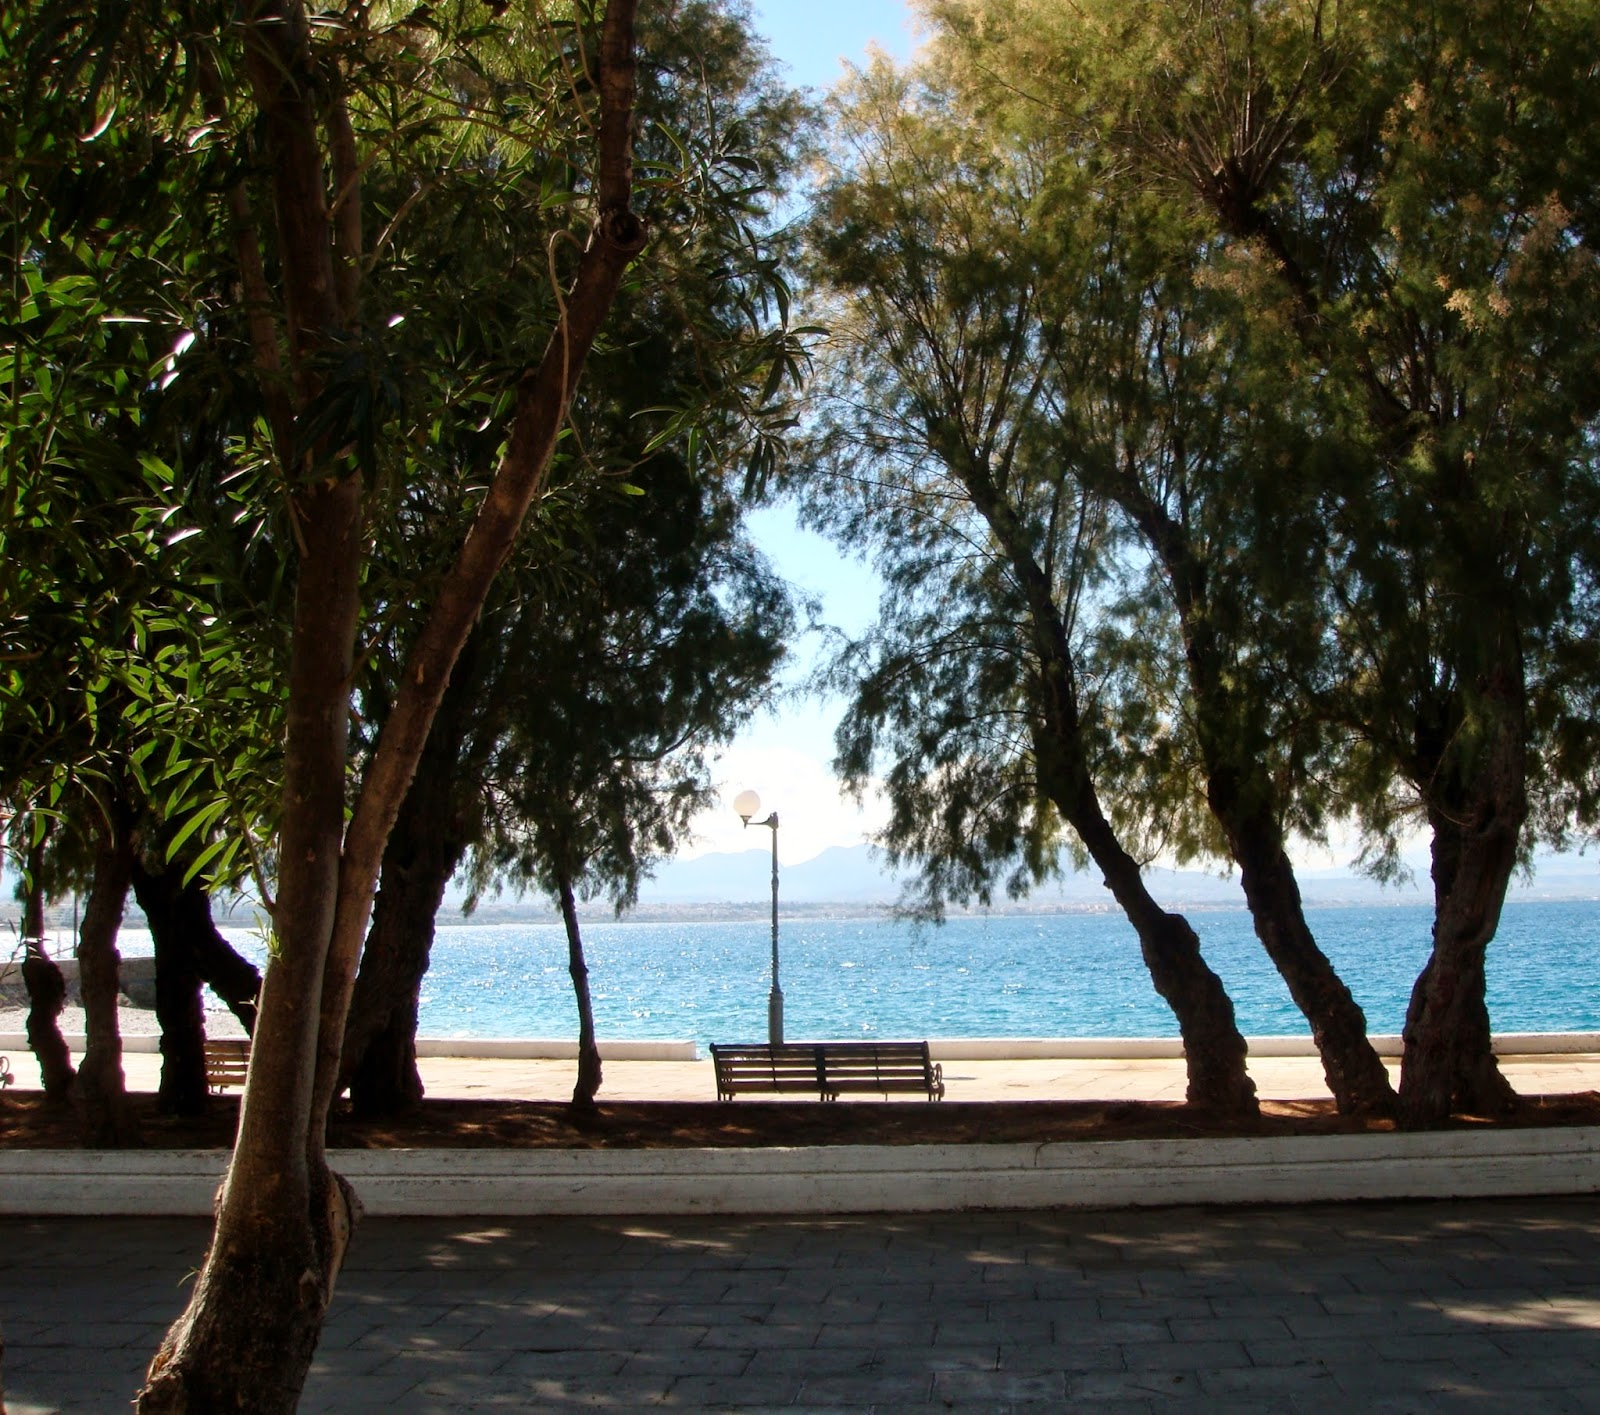 Loutraki park